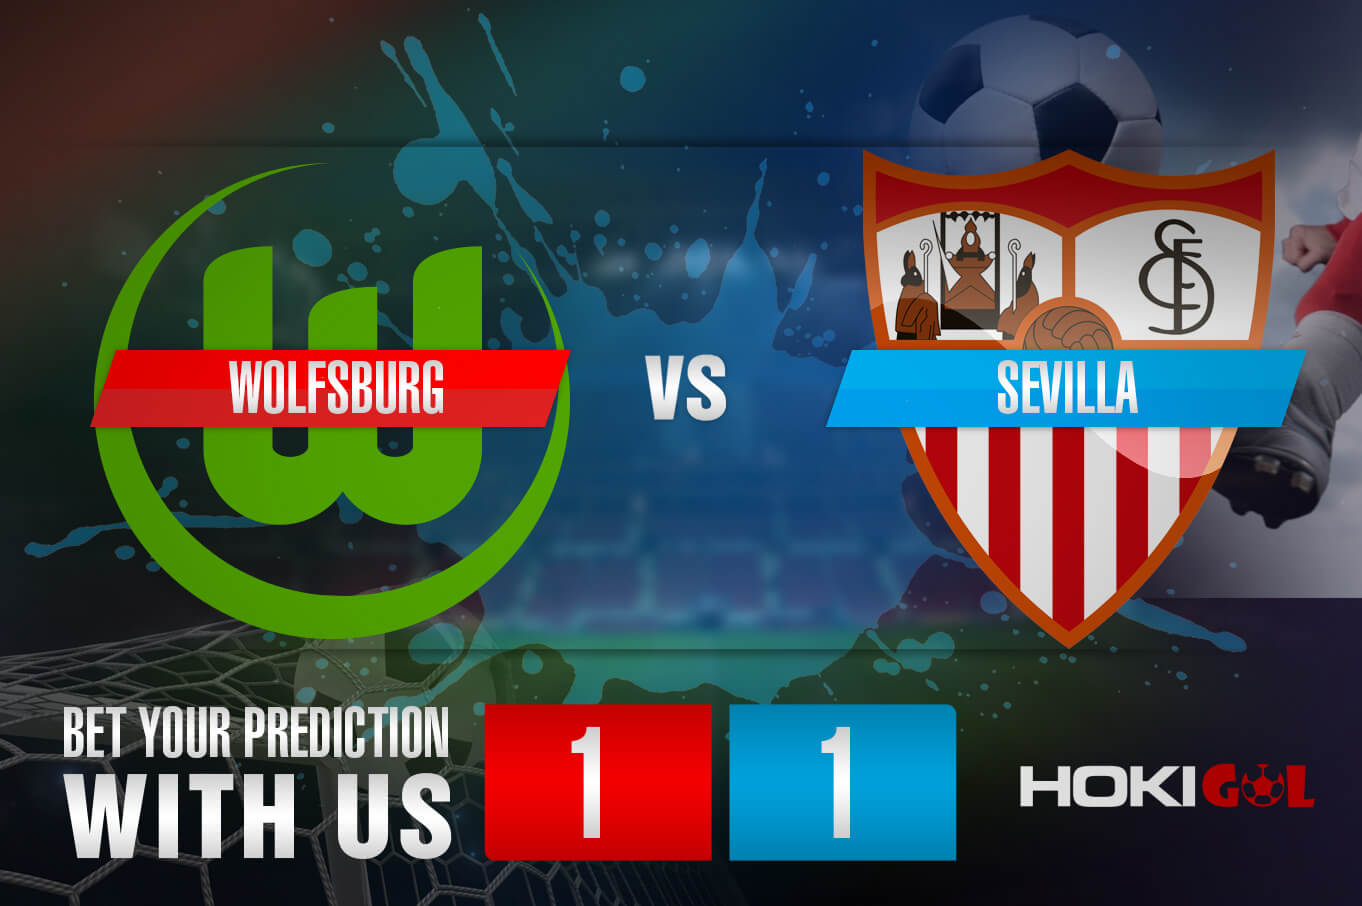 Prediksi Bola Wolfsburg Vs Sevilla 30 September 2021